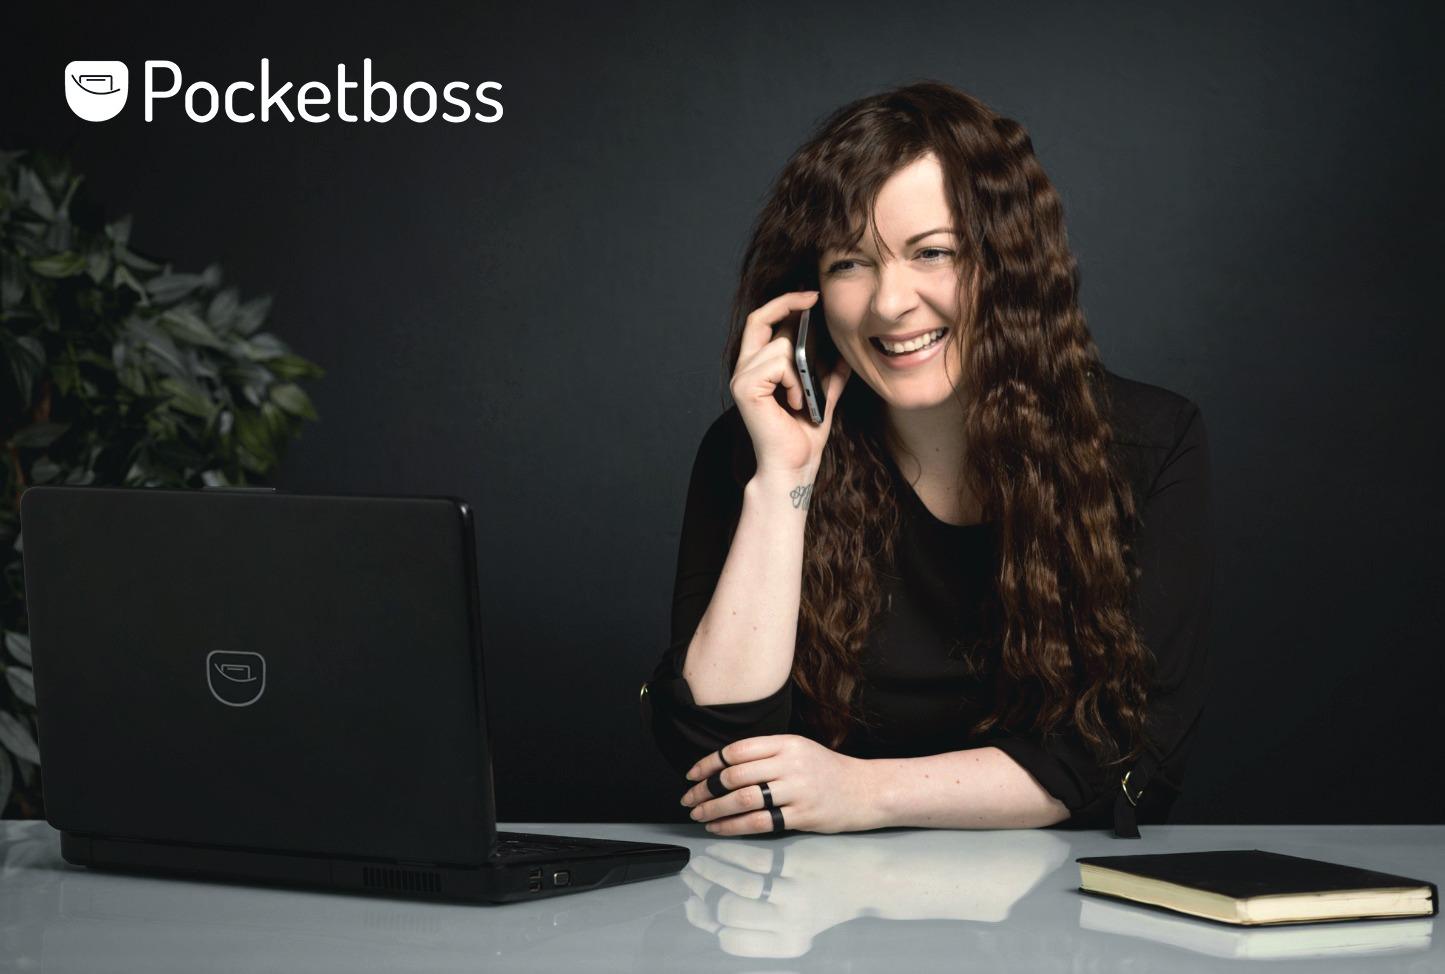 Michelle-Costello-Founder-Pocketboss